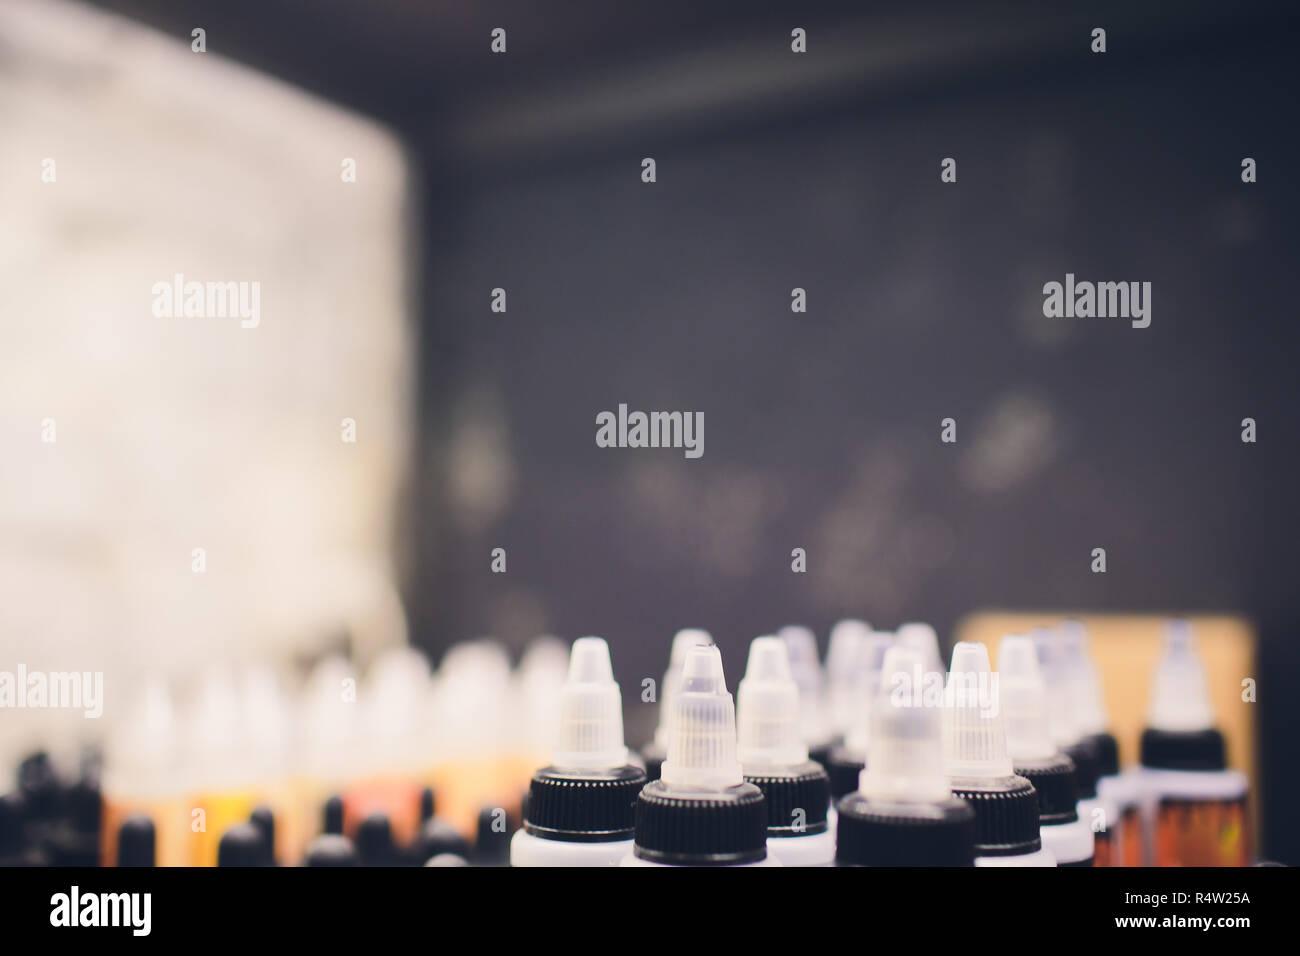 Flavor for electronic cigarette bottle liquid vape. Stock Photo